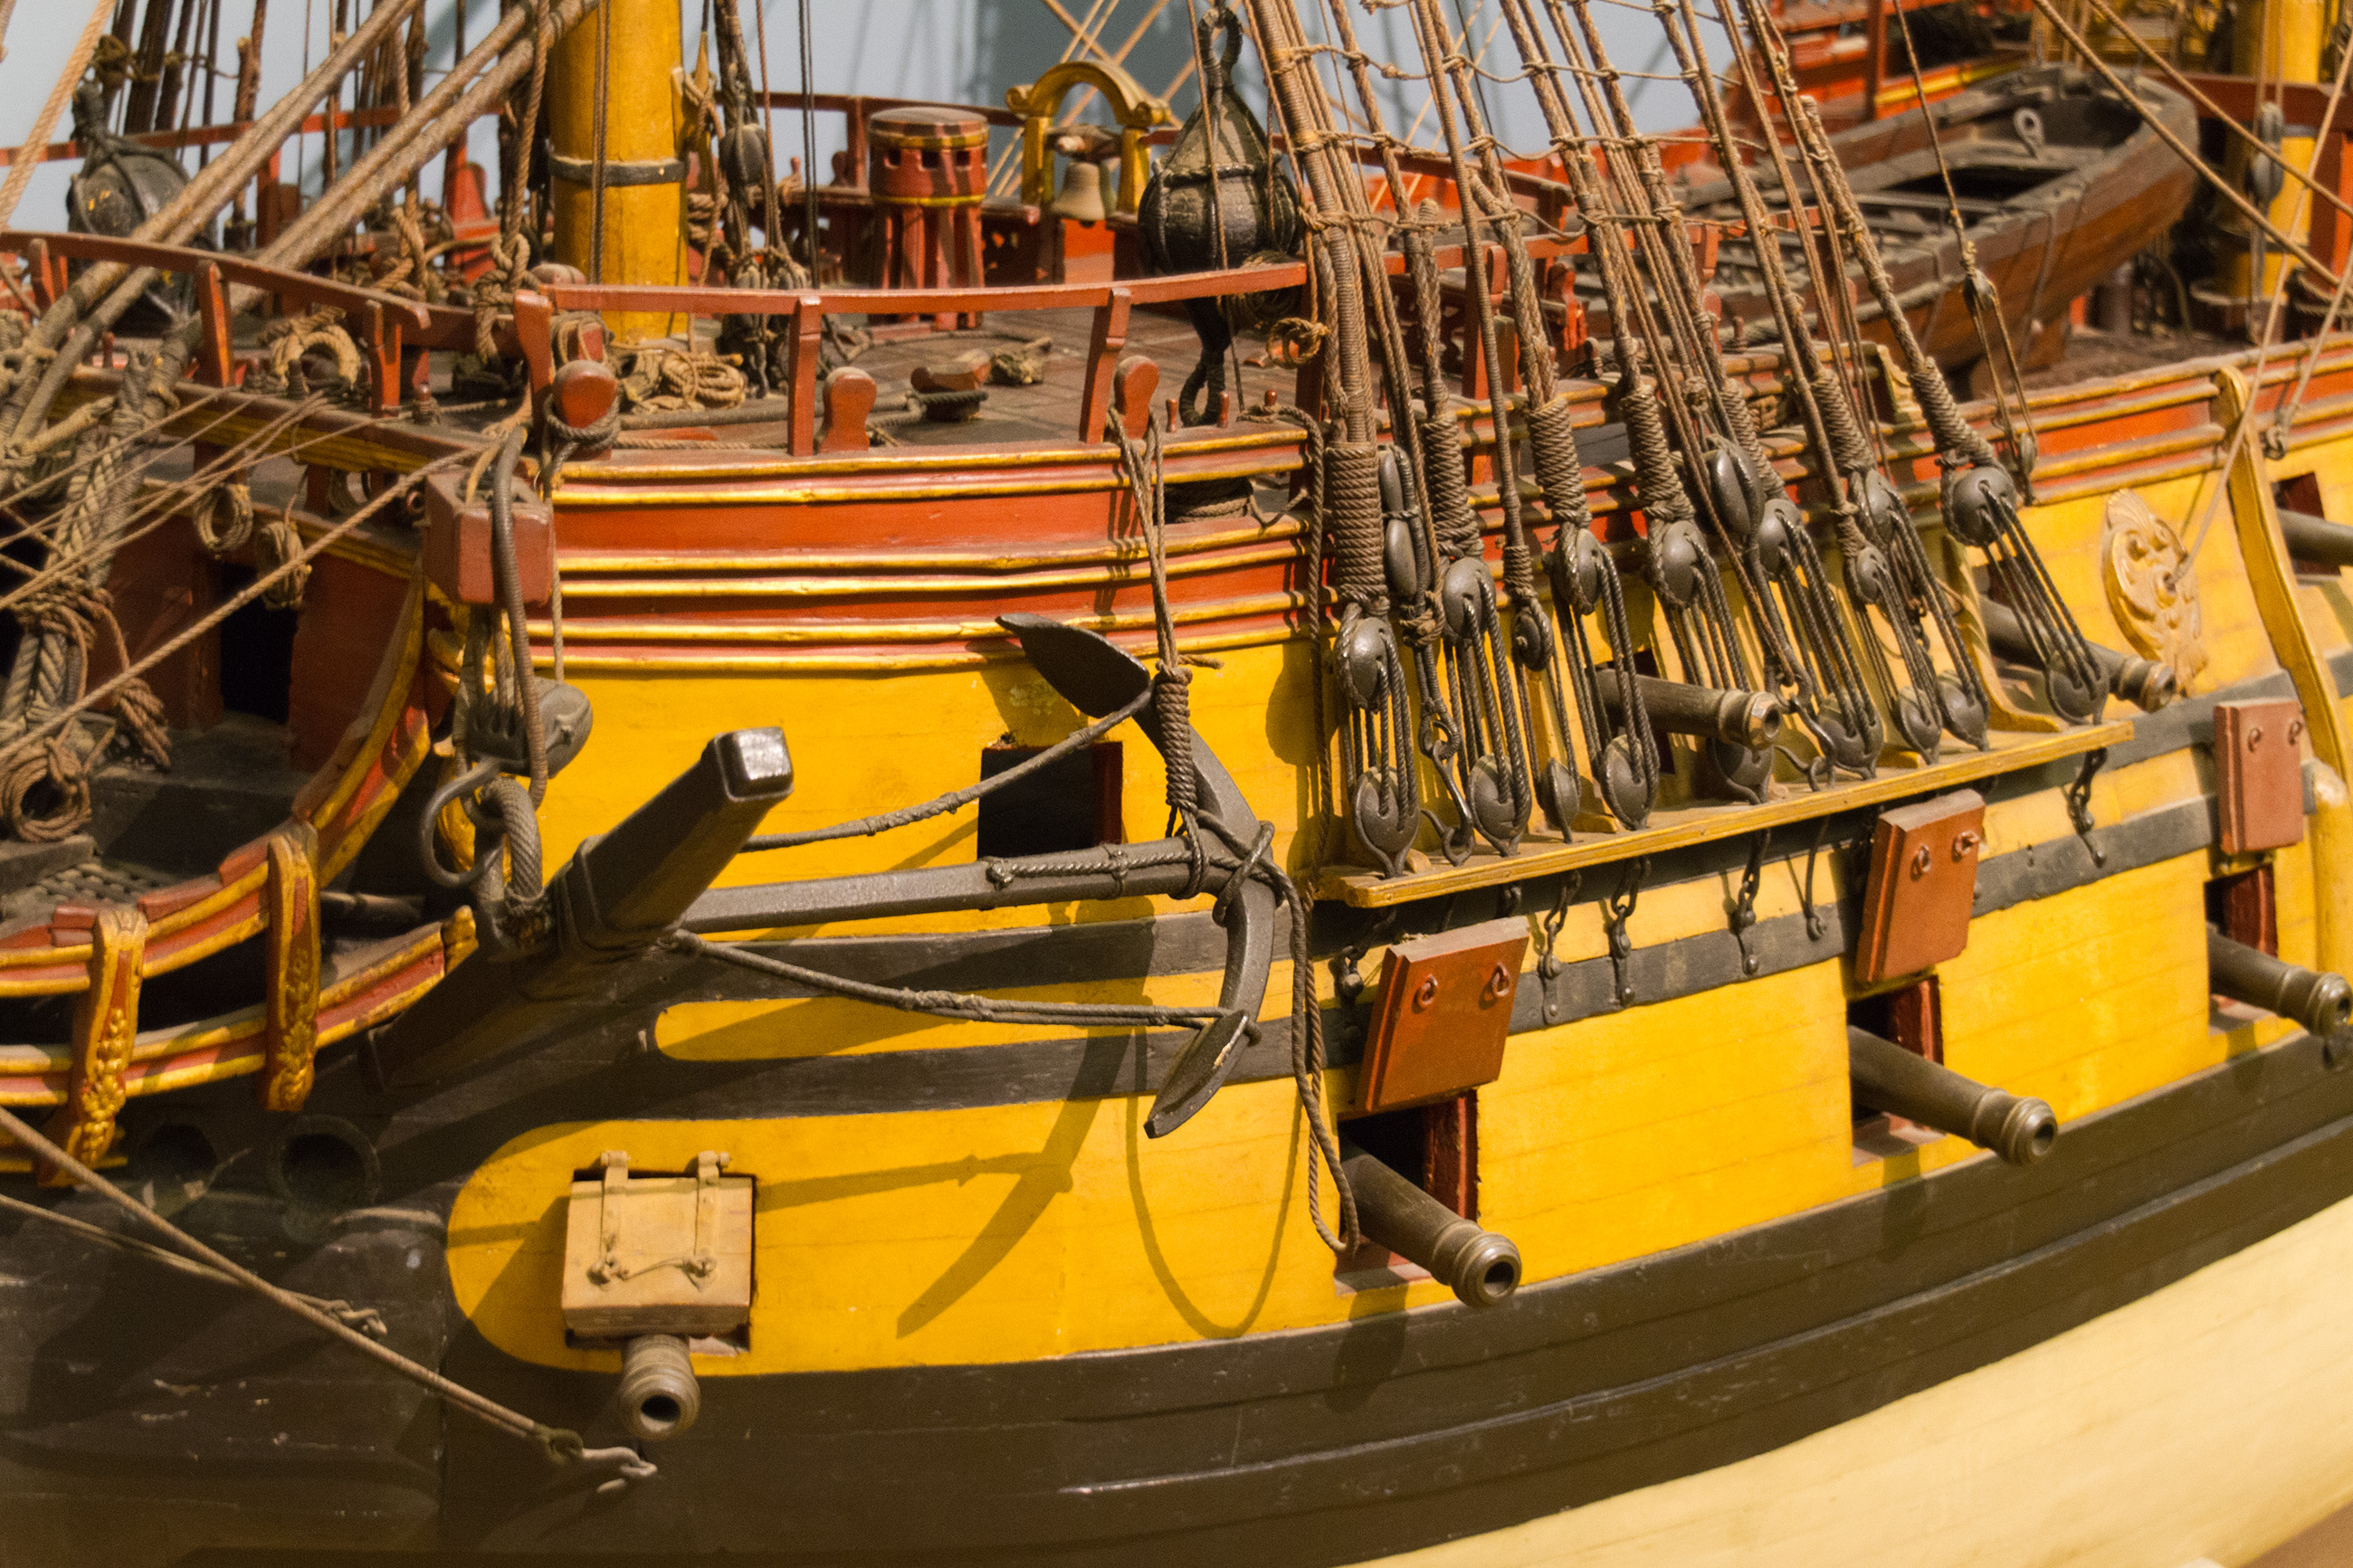 Ship, Sailboat, Wood, Warship, War, HQ Photo